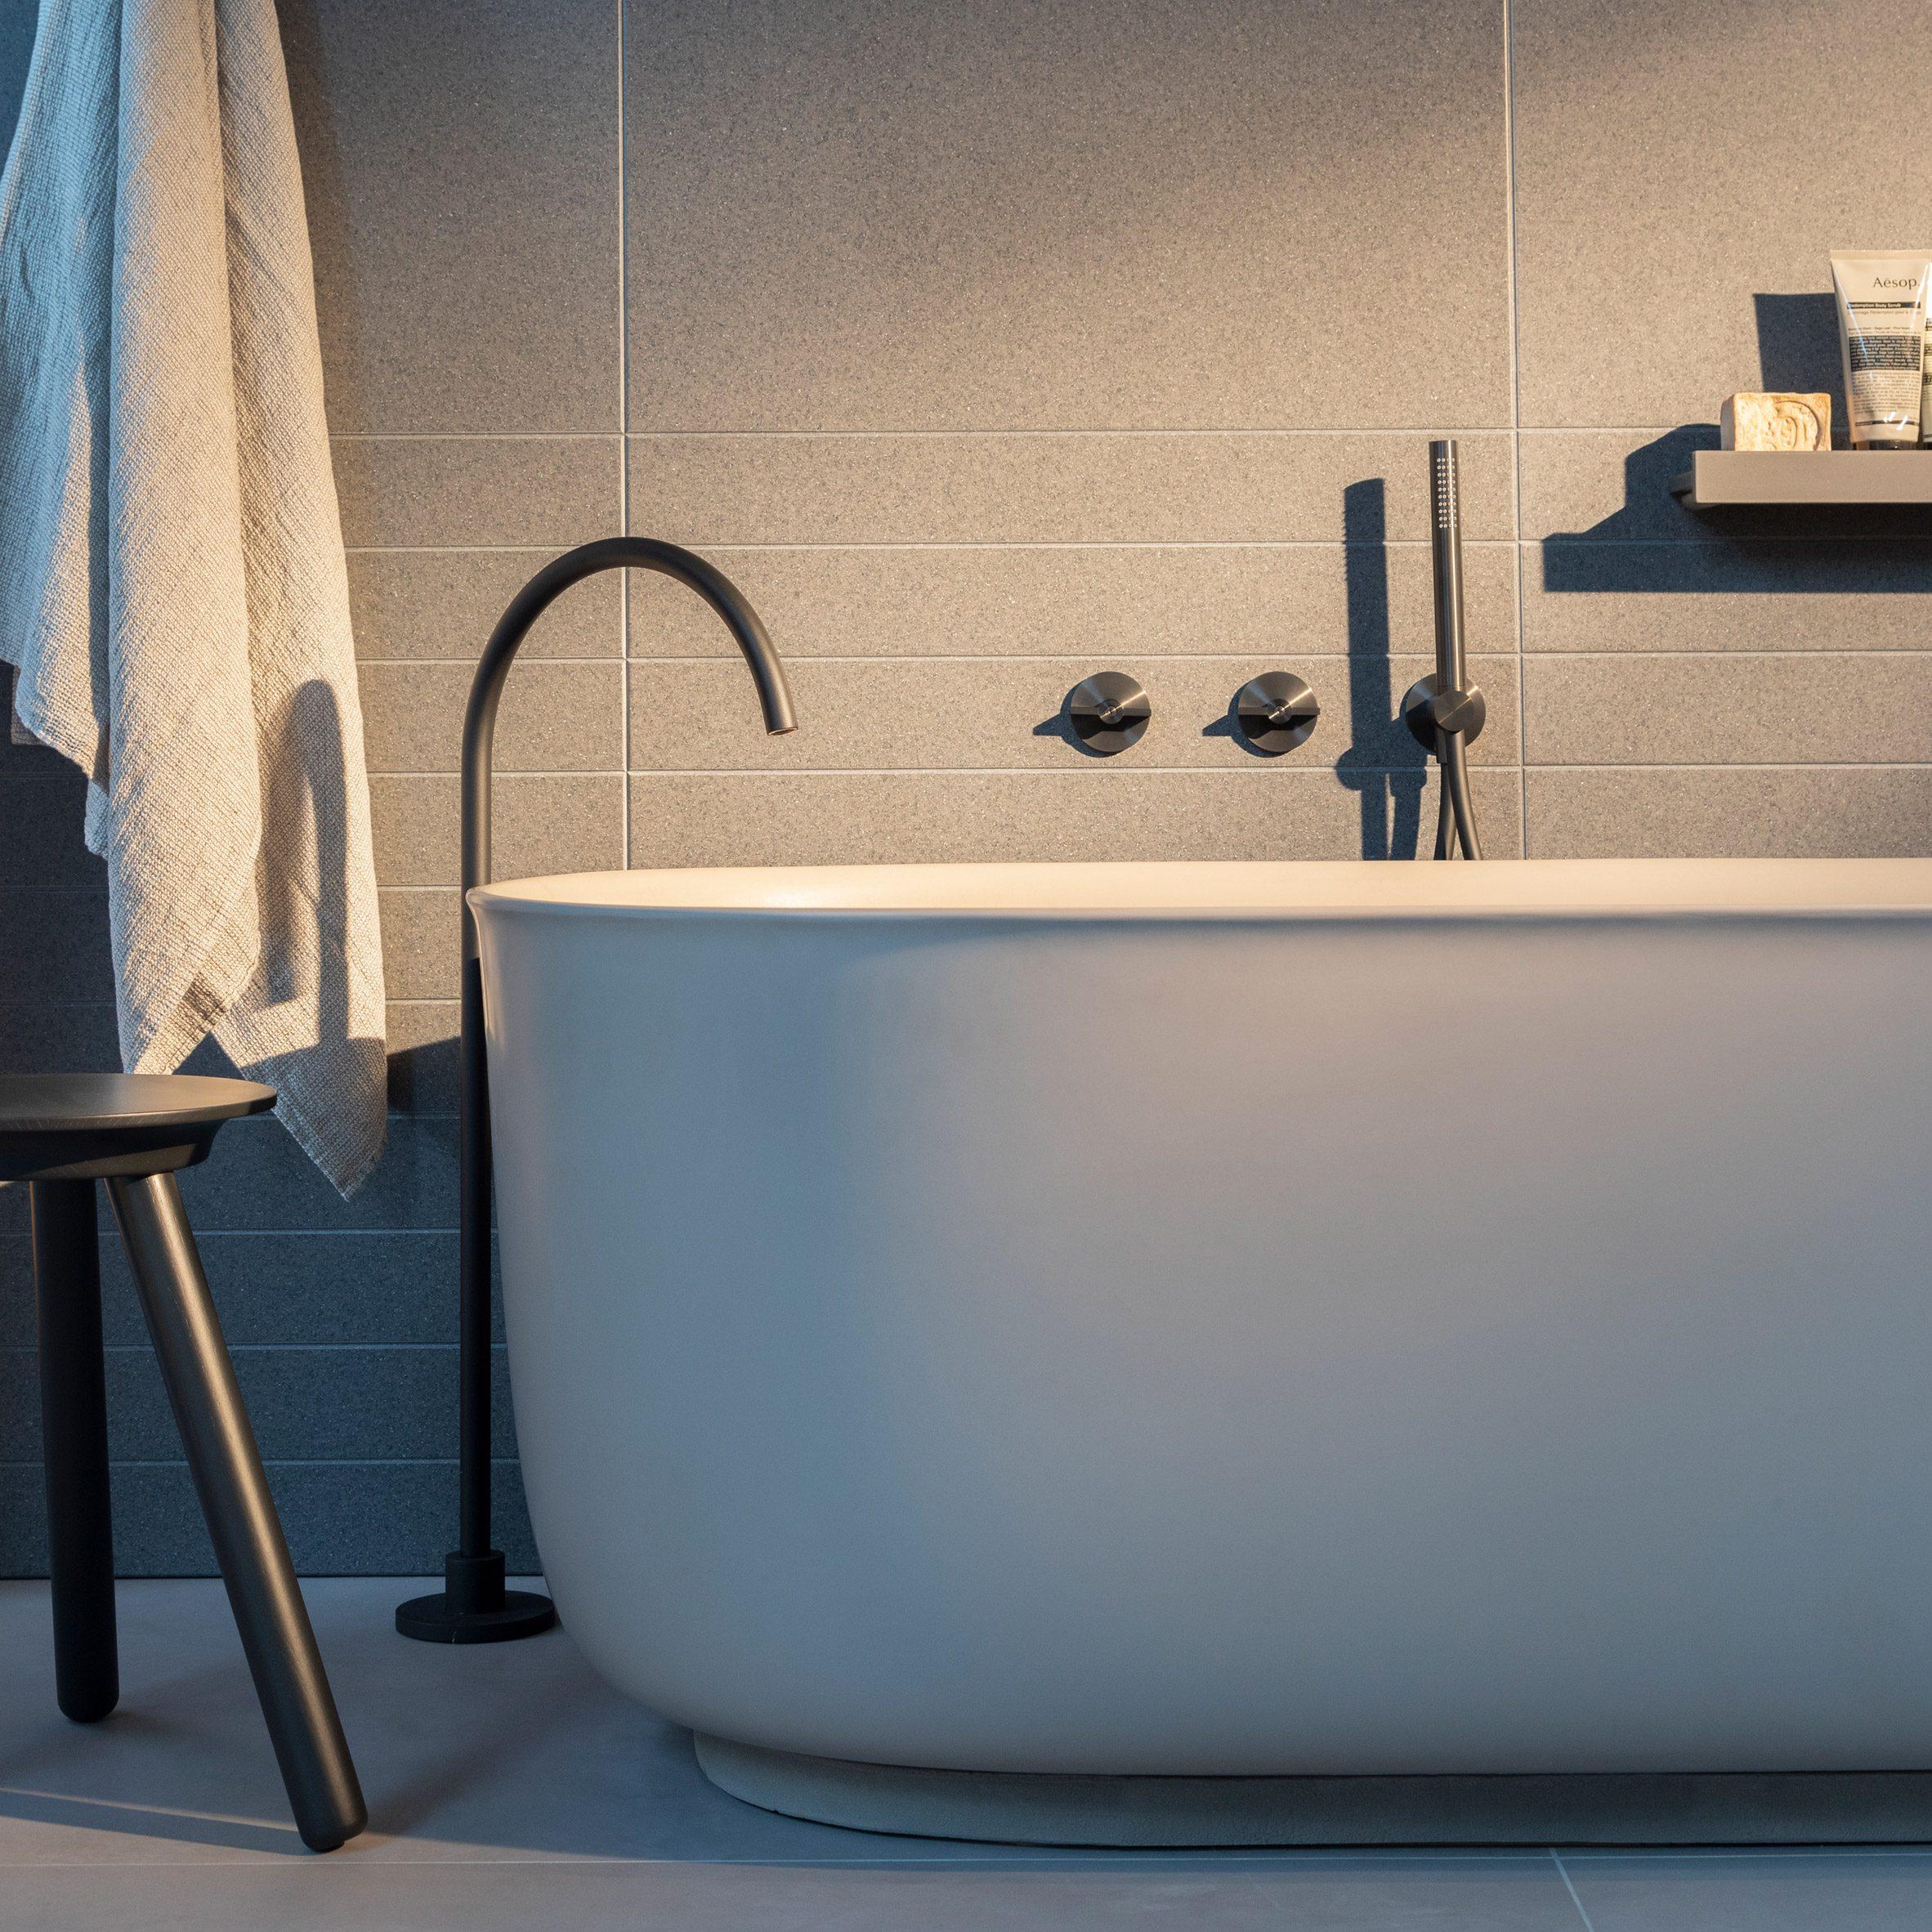 Valvola01 bathroom taps by Studio Adolini for Quadro Design